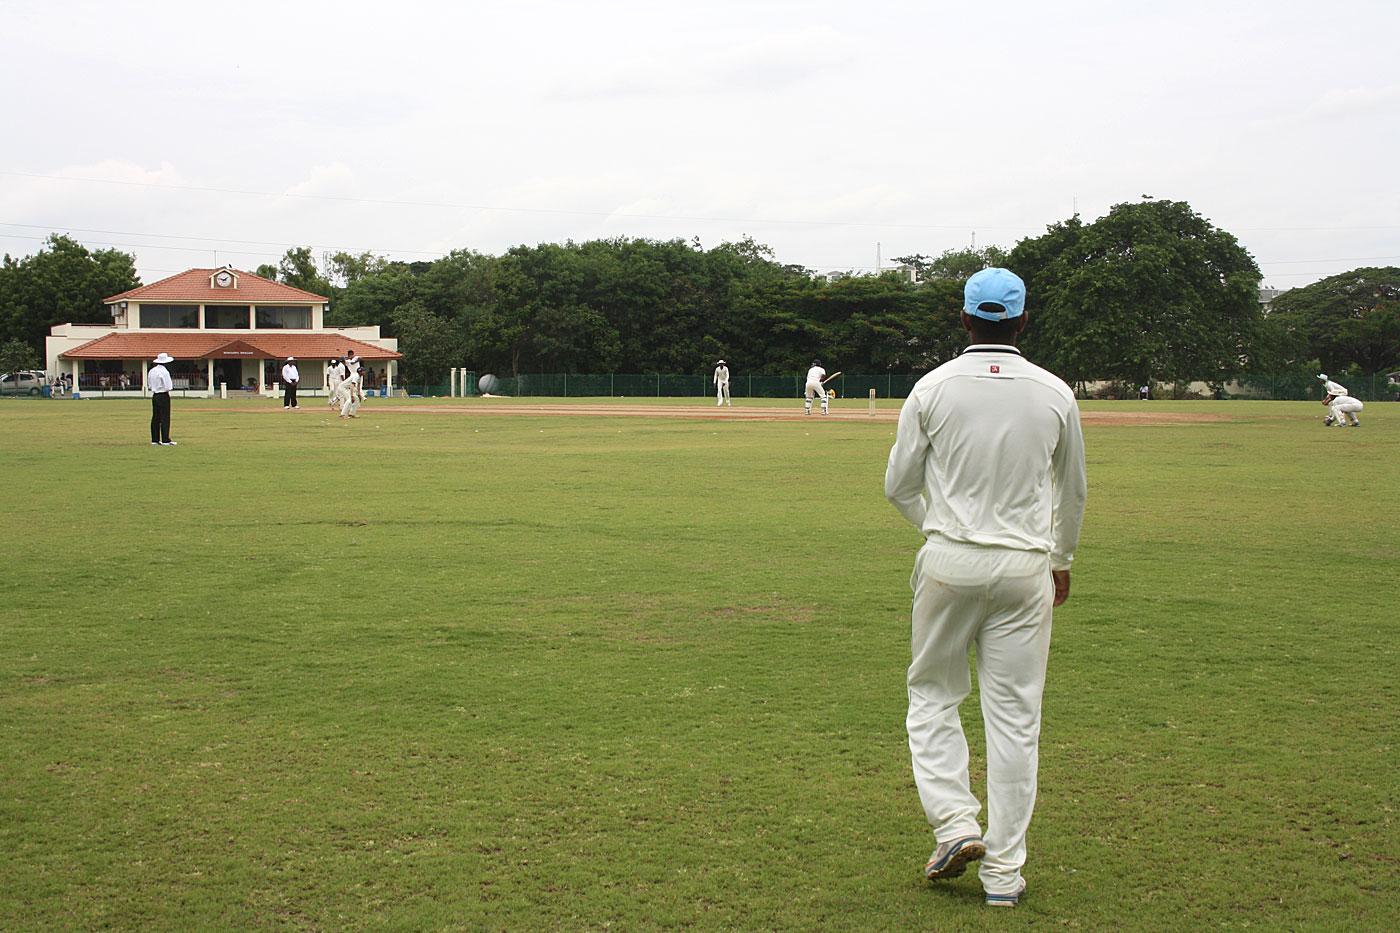 A Buchi Babu semi-final at the Murugappa Cricket Ground in Avadi, Chennai